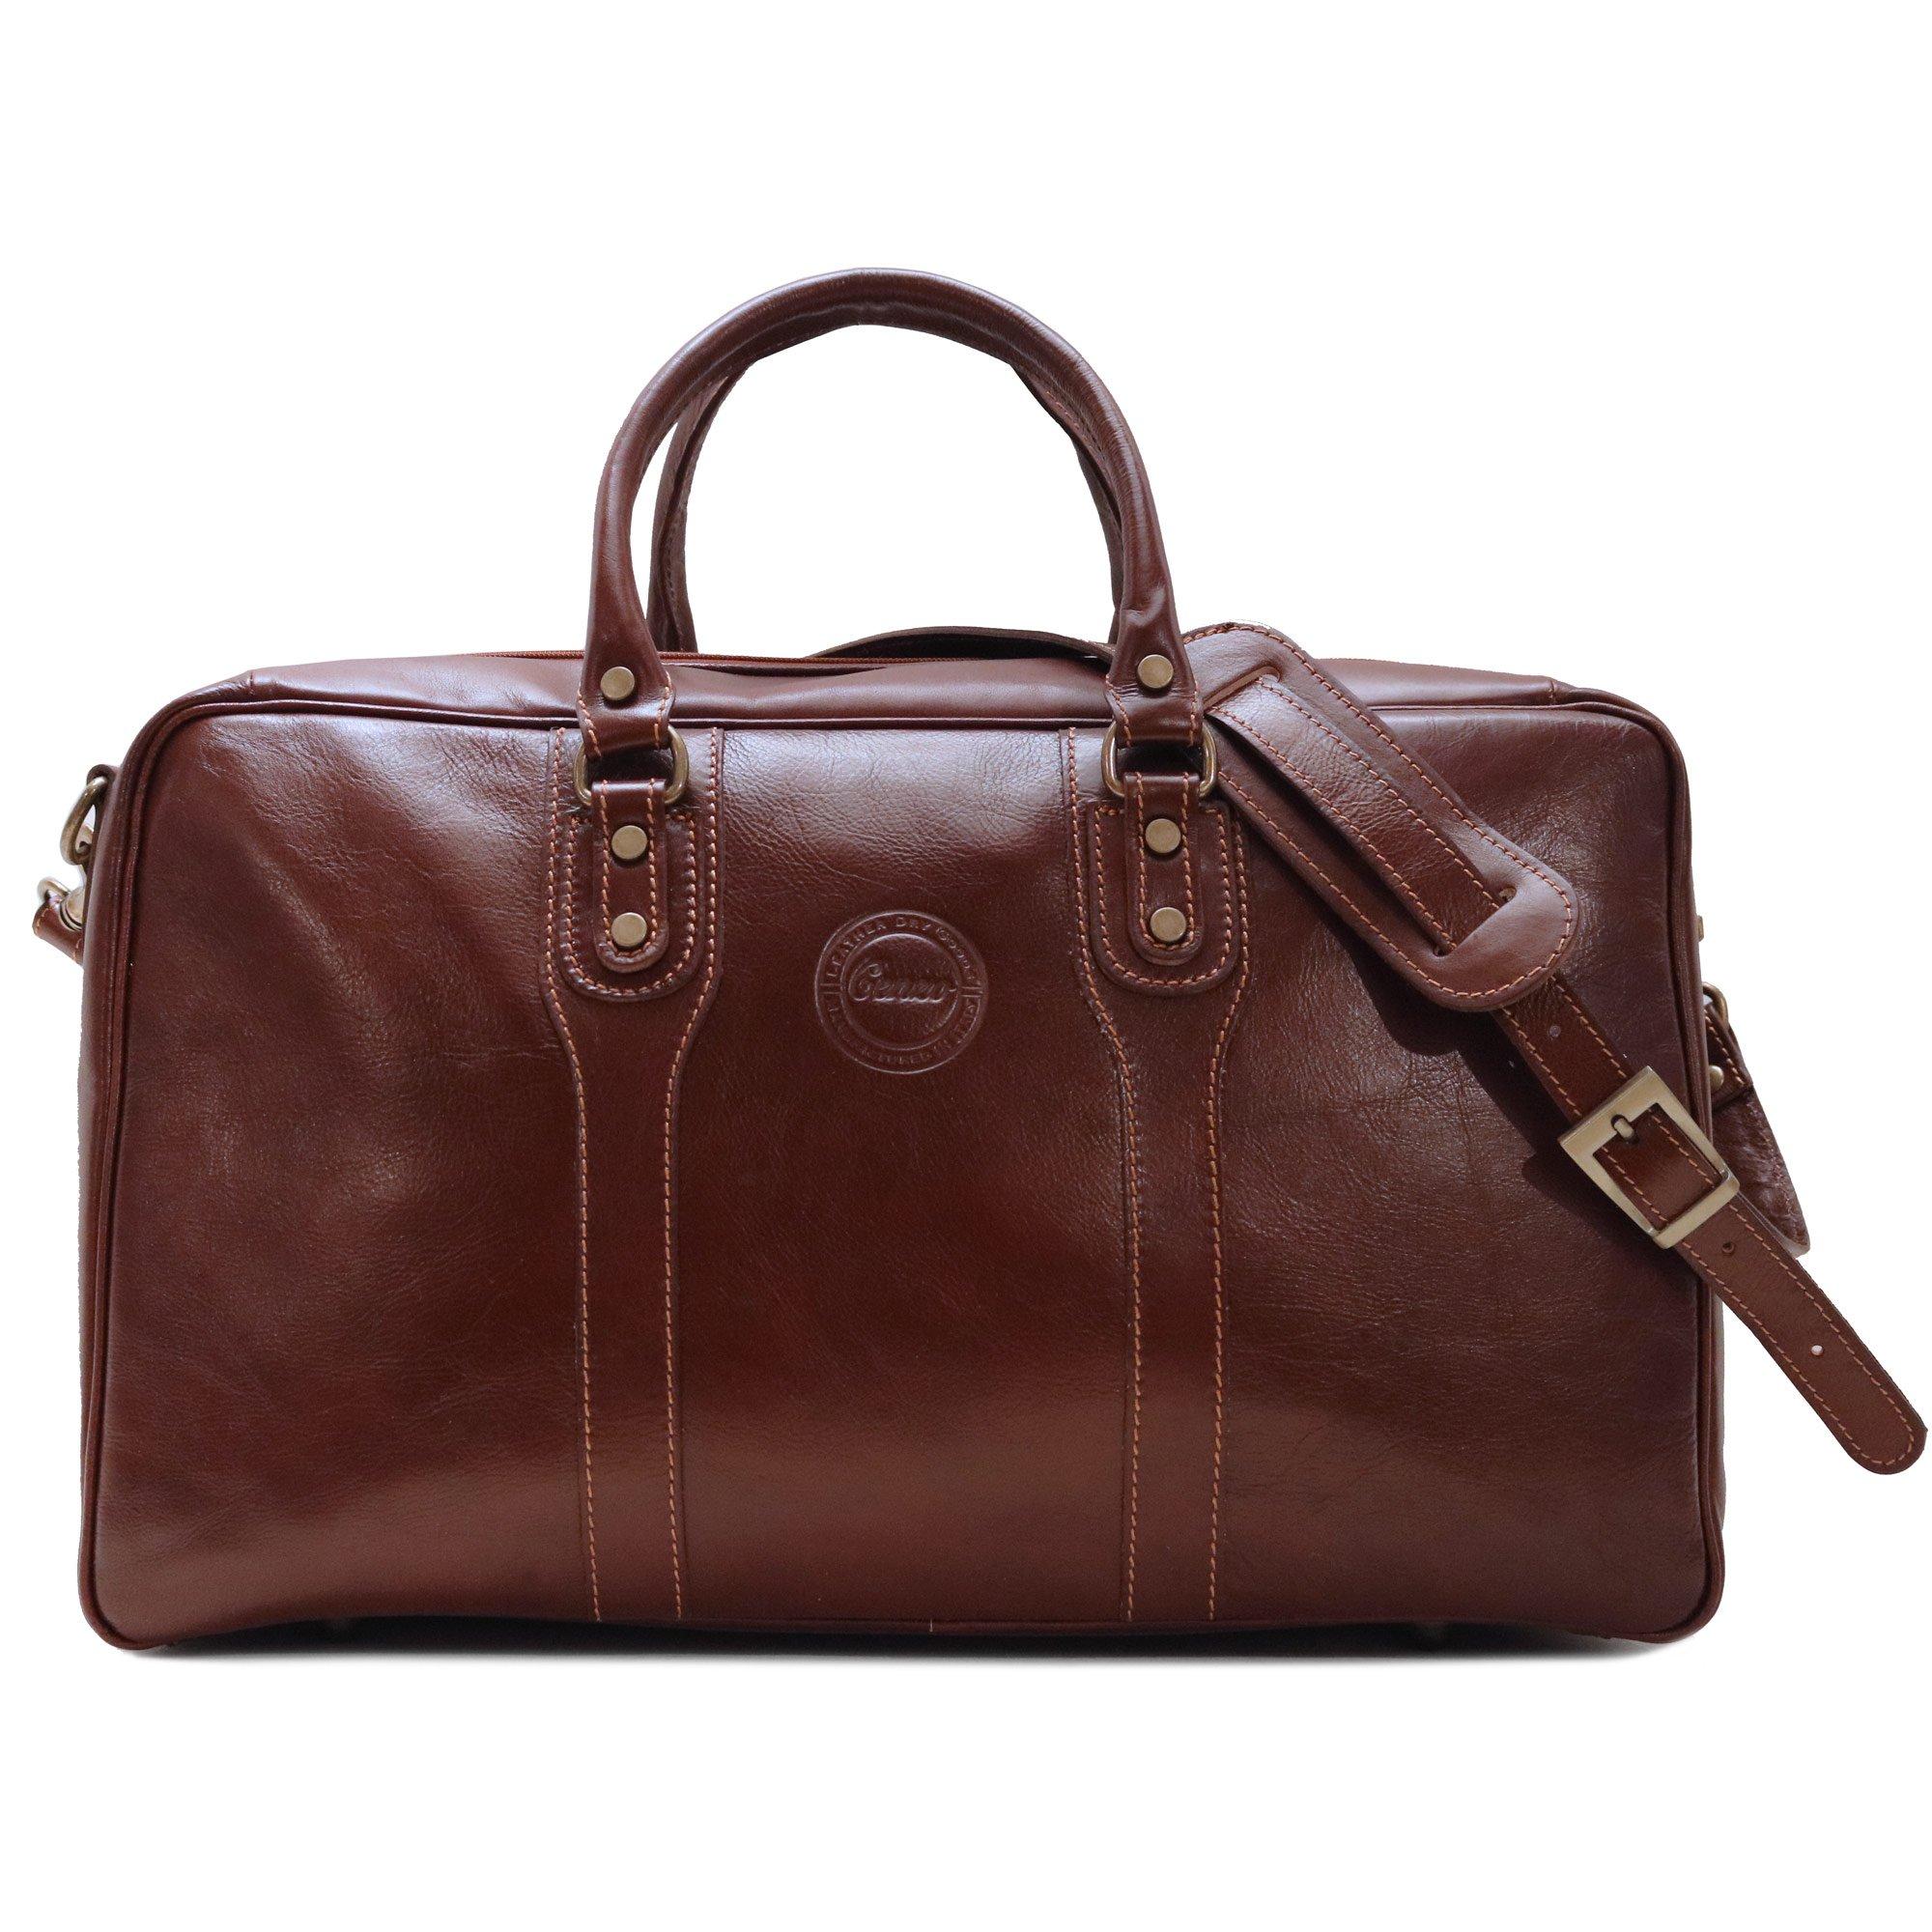 Cenzo Leather Suitcase Duffle Bag